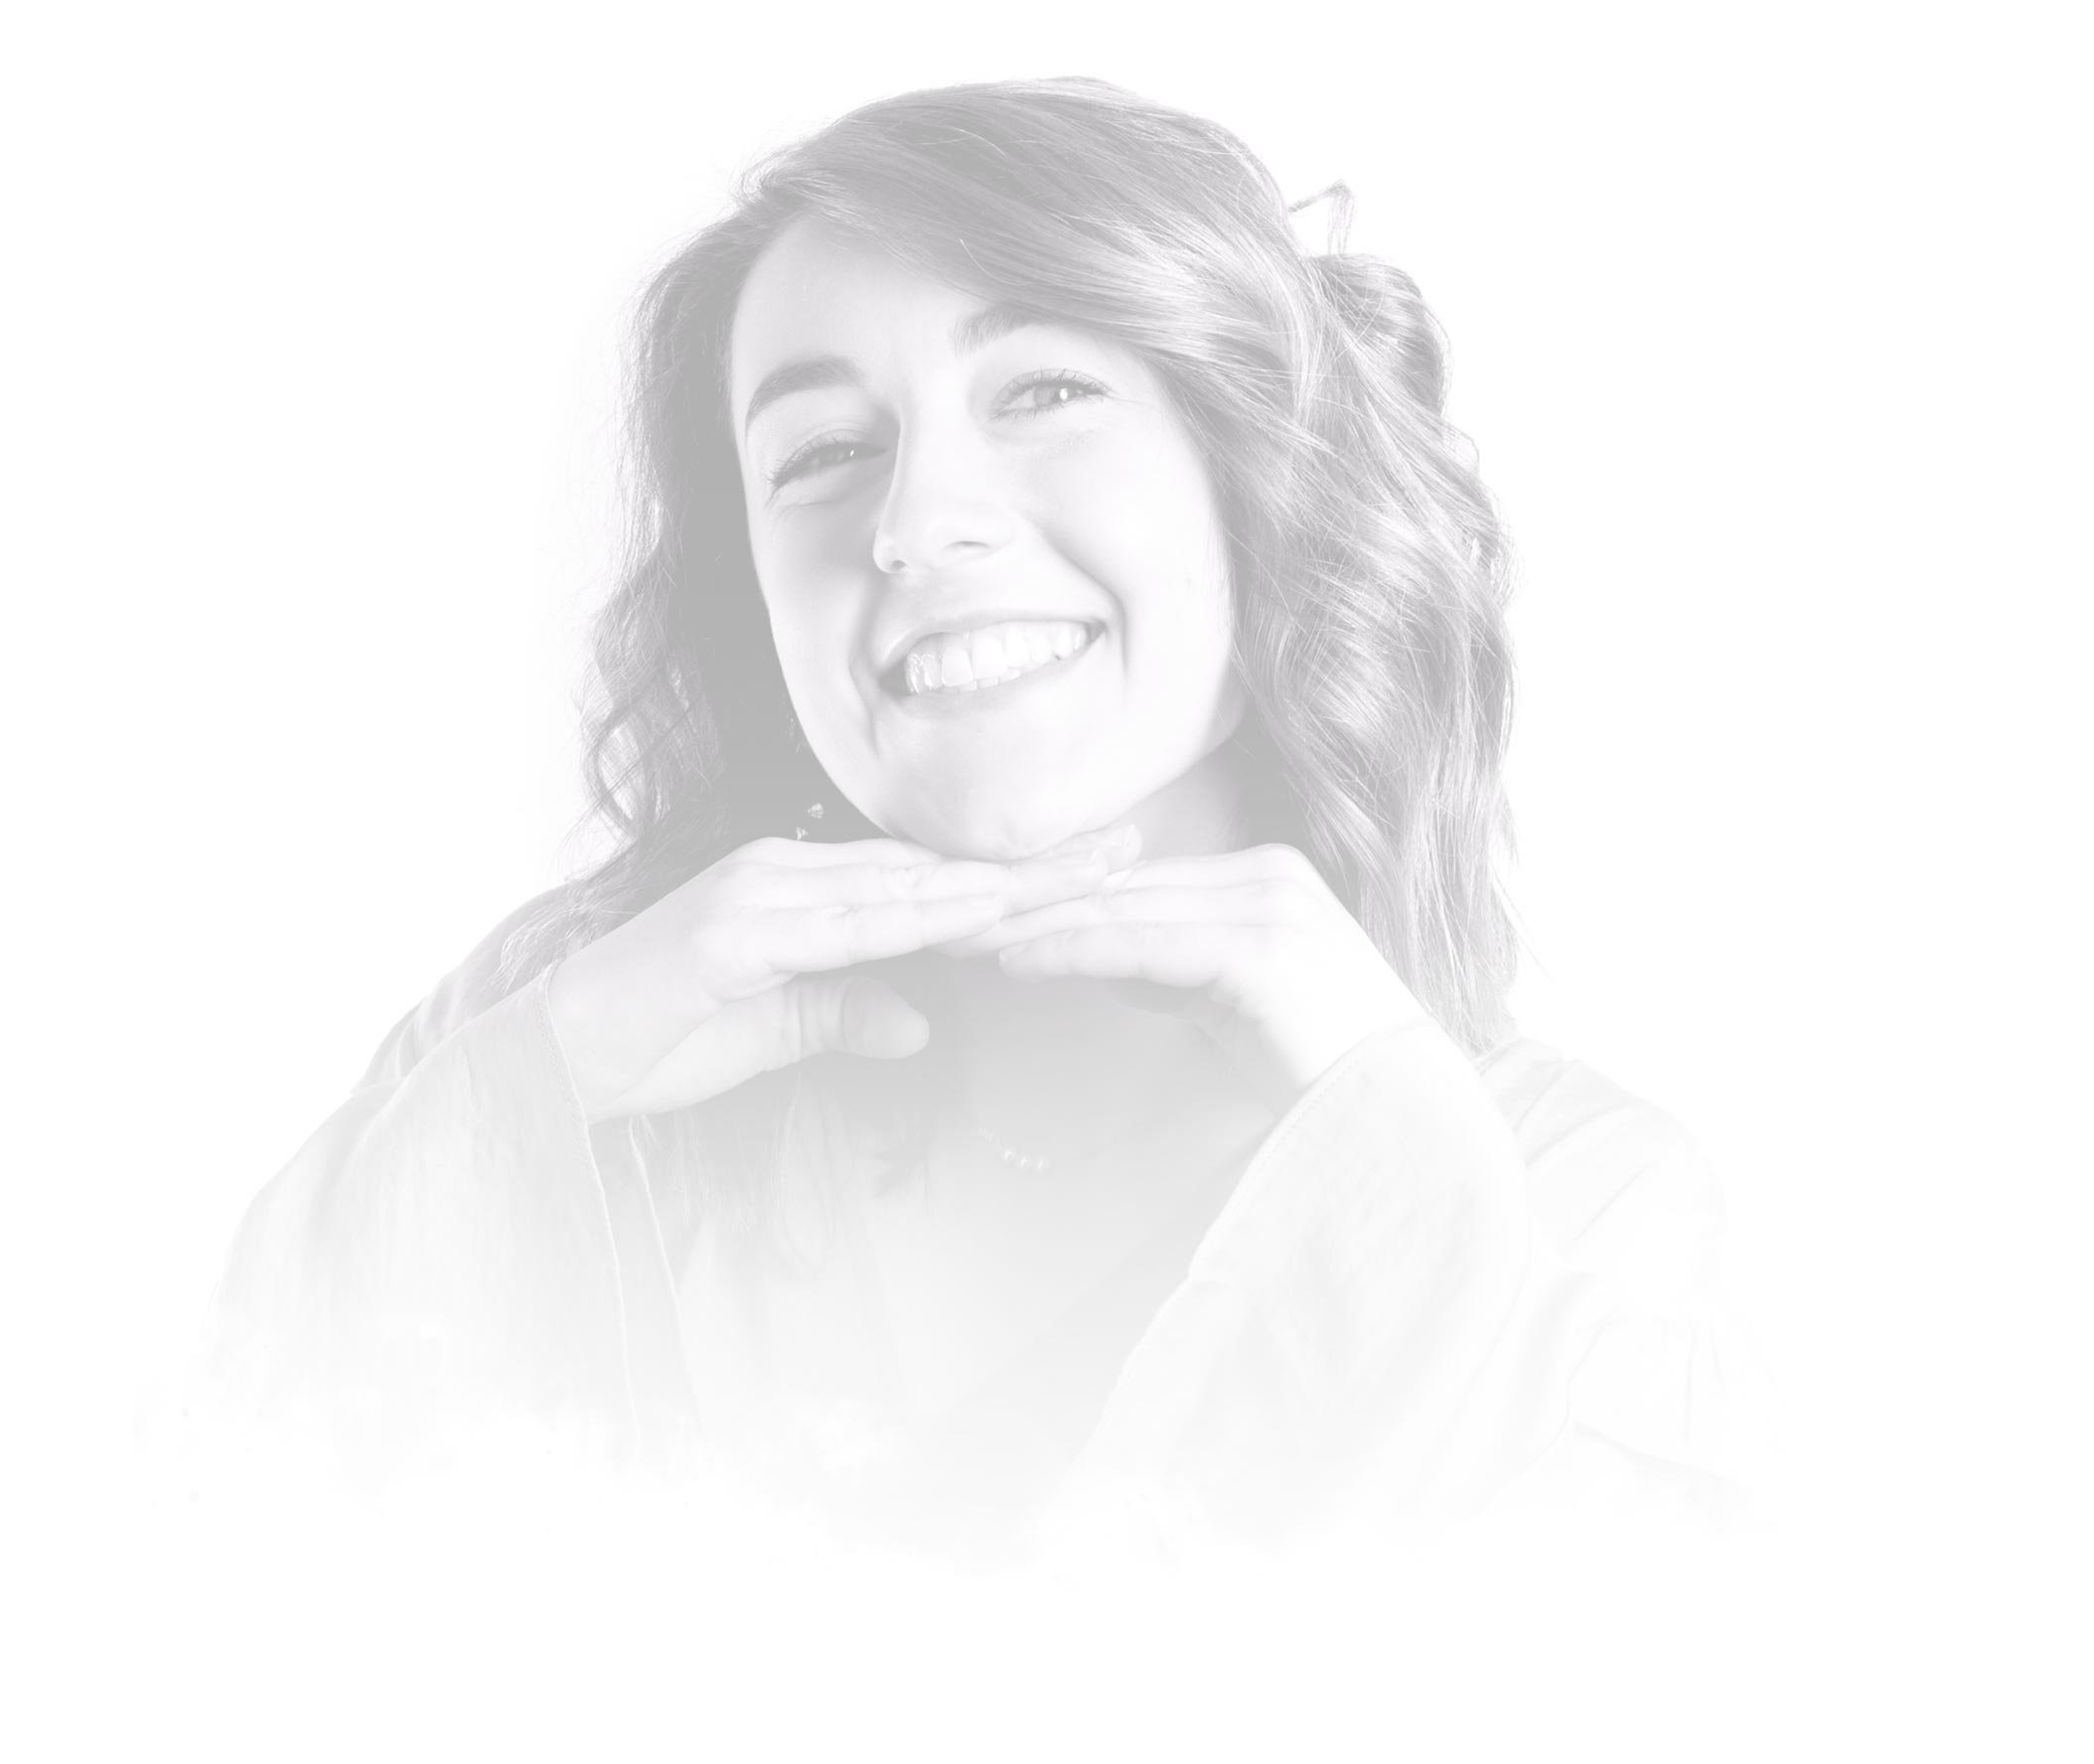 Amelia Lawrey | Meet the Team | Agency | OOHology